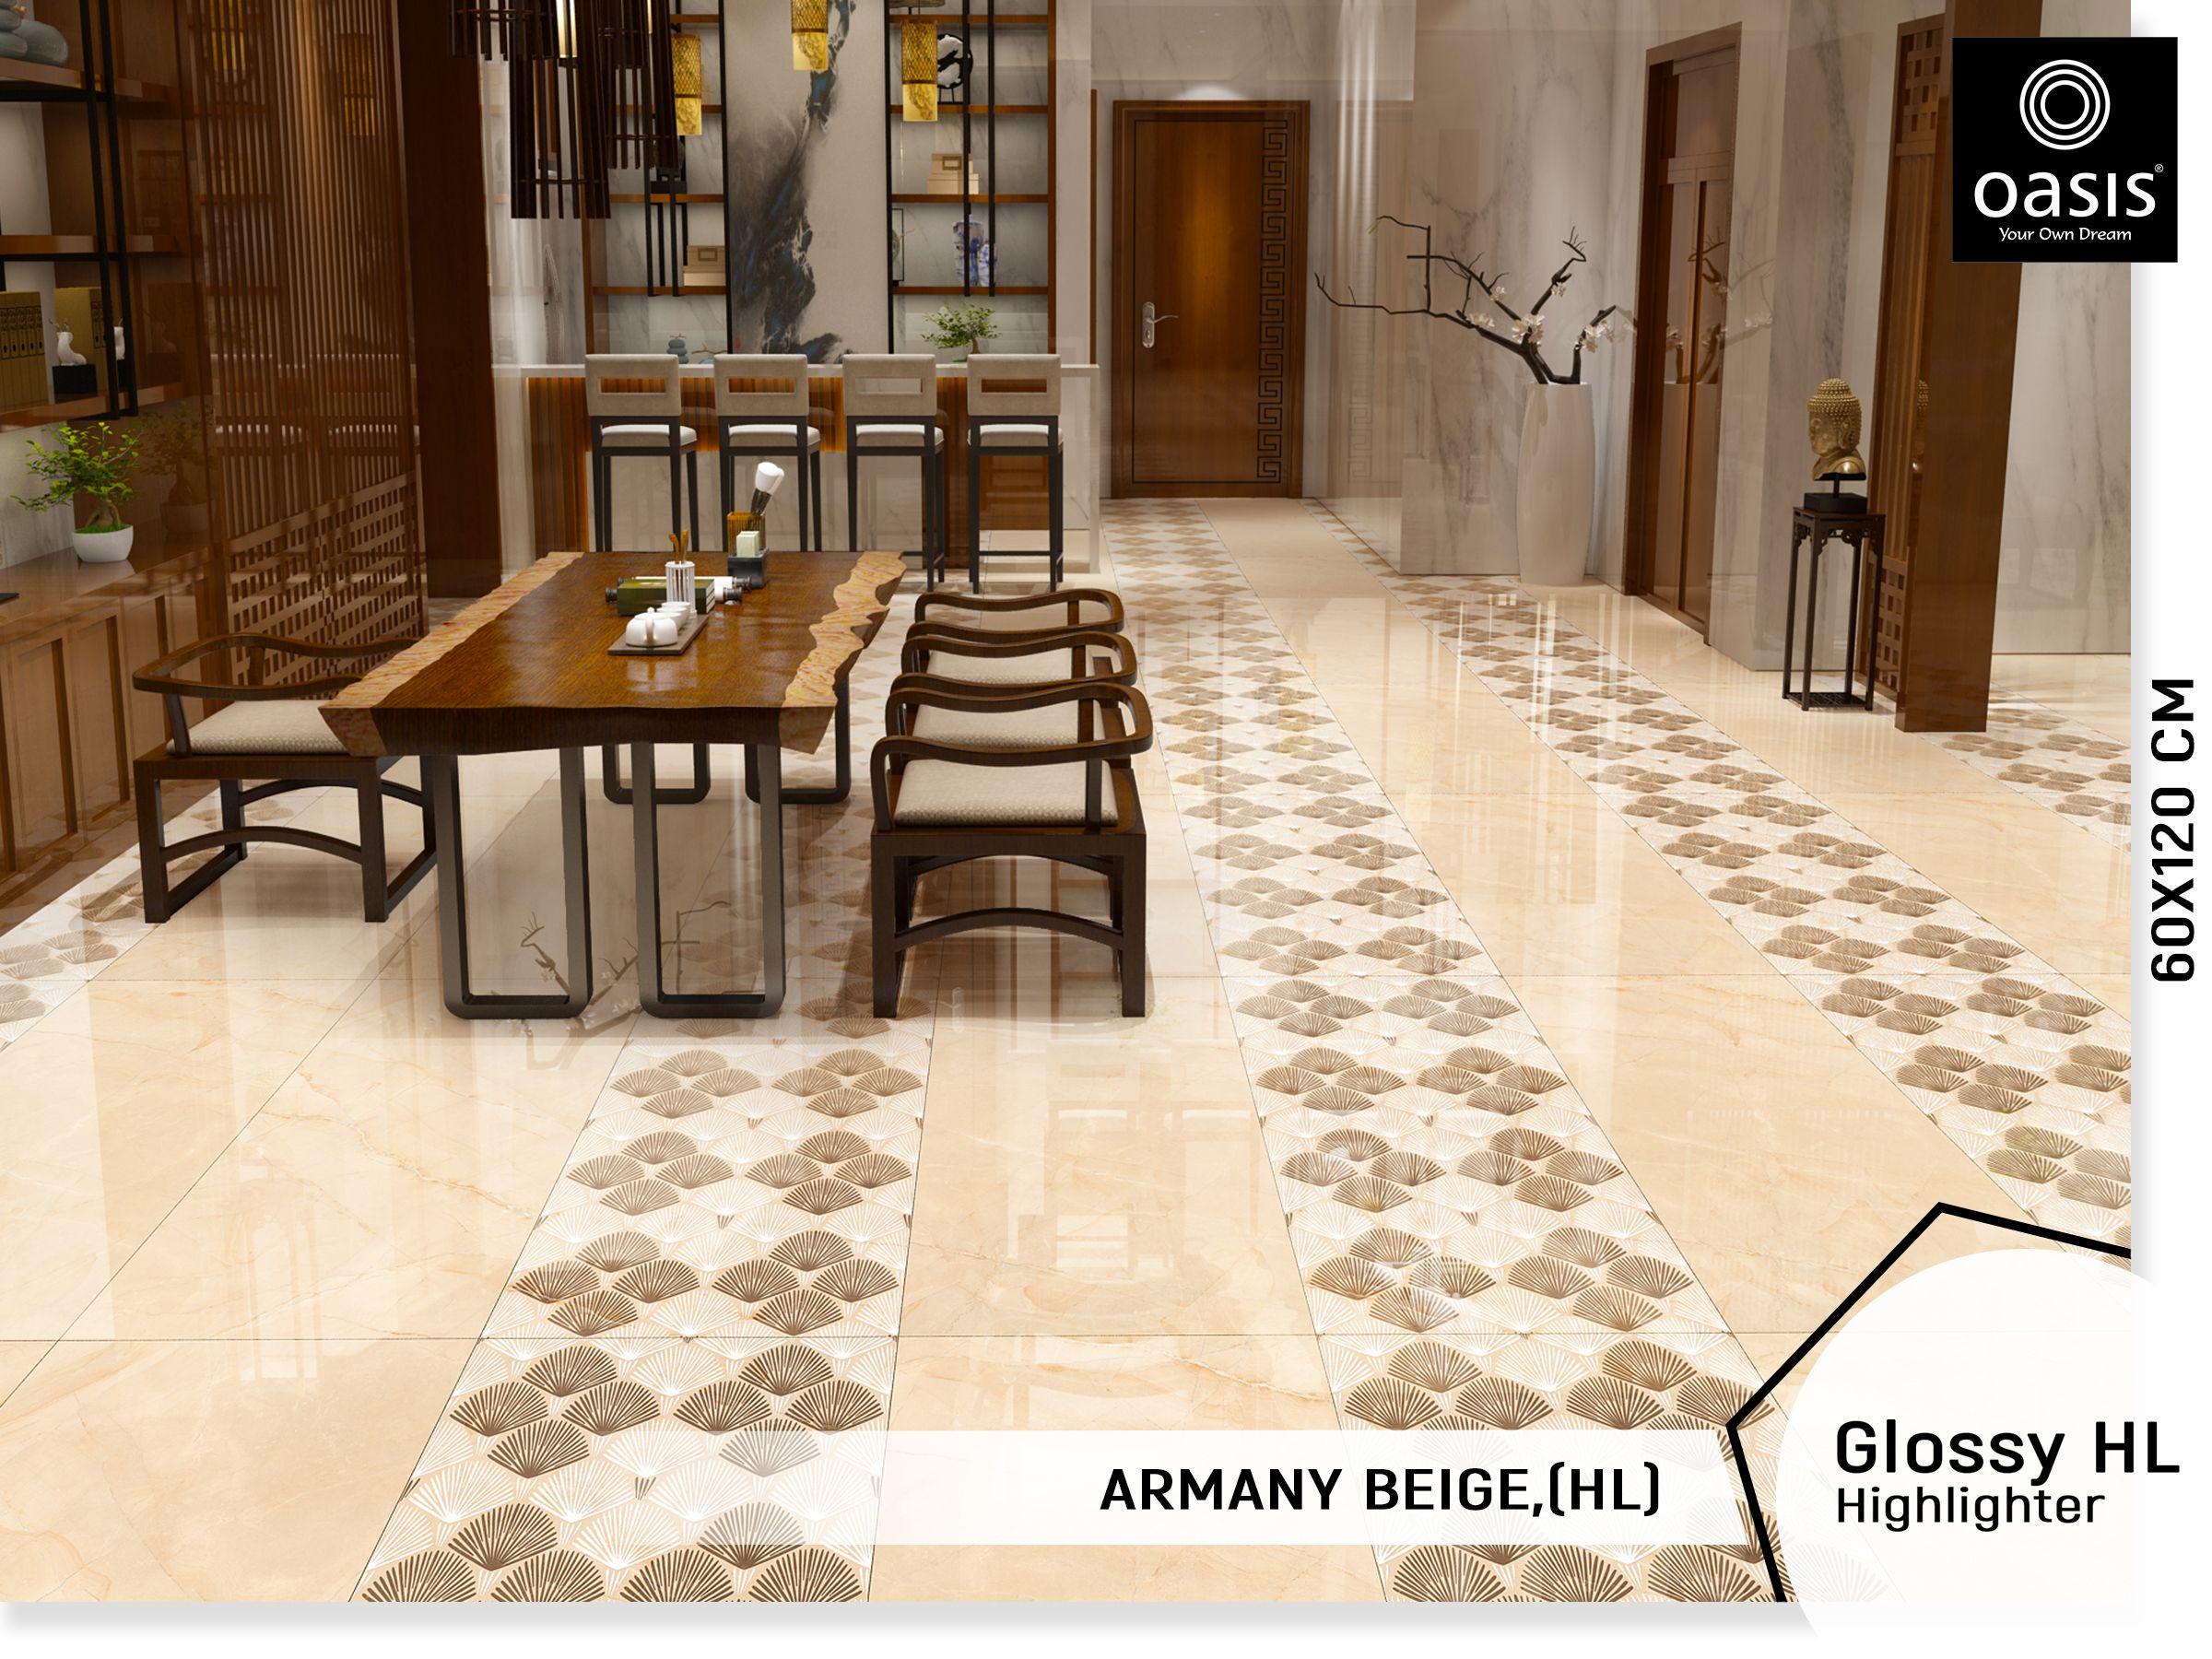 Glossy Highlighter Armany Beige 60 120 Cms Wall Tiles Design Tile Design Ceramic Floor